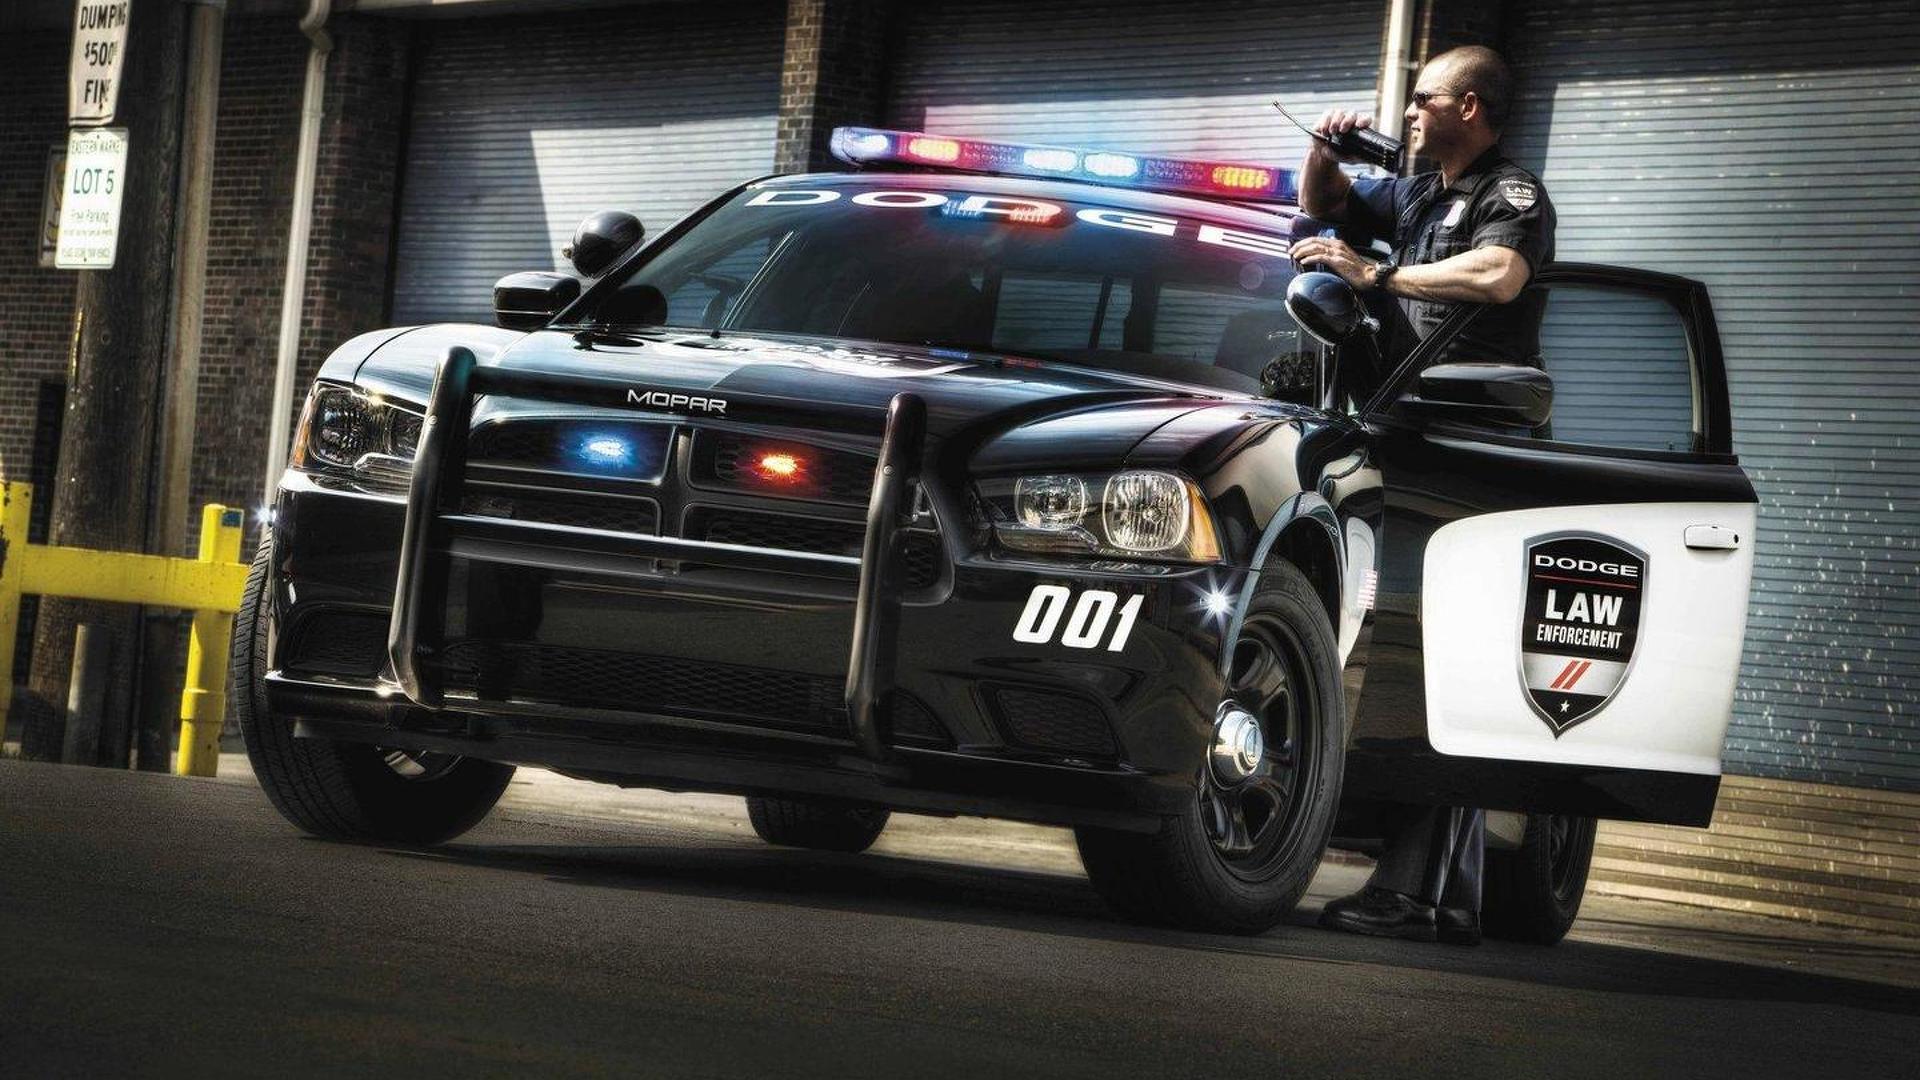 Dodge Charger Pursuit >> 2012 Dodge Charger Pursuit Is Fastest Police Car